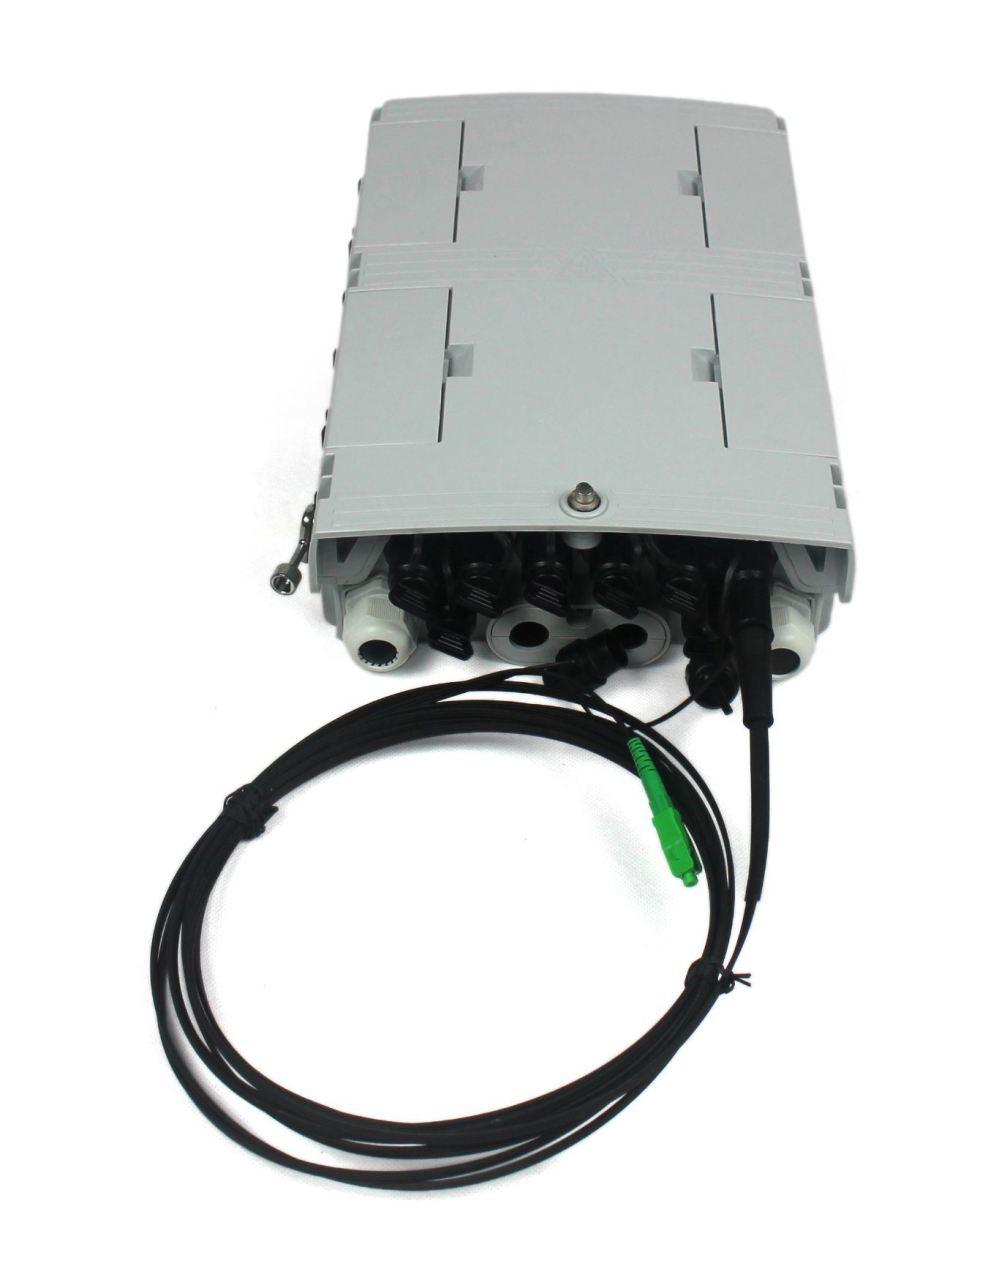 medium resolution of china waterproof 8 ports fiber optic splitter box for 5mm drop cable china splitter box waterproof splitter box